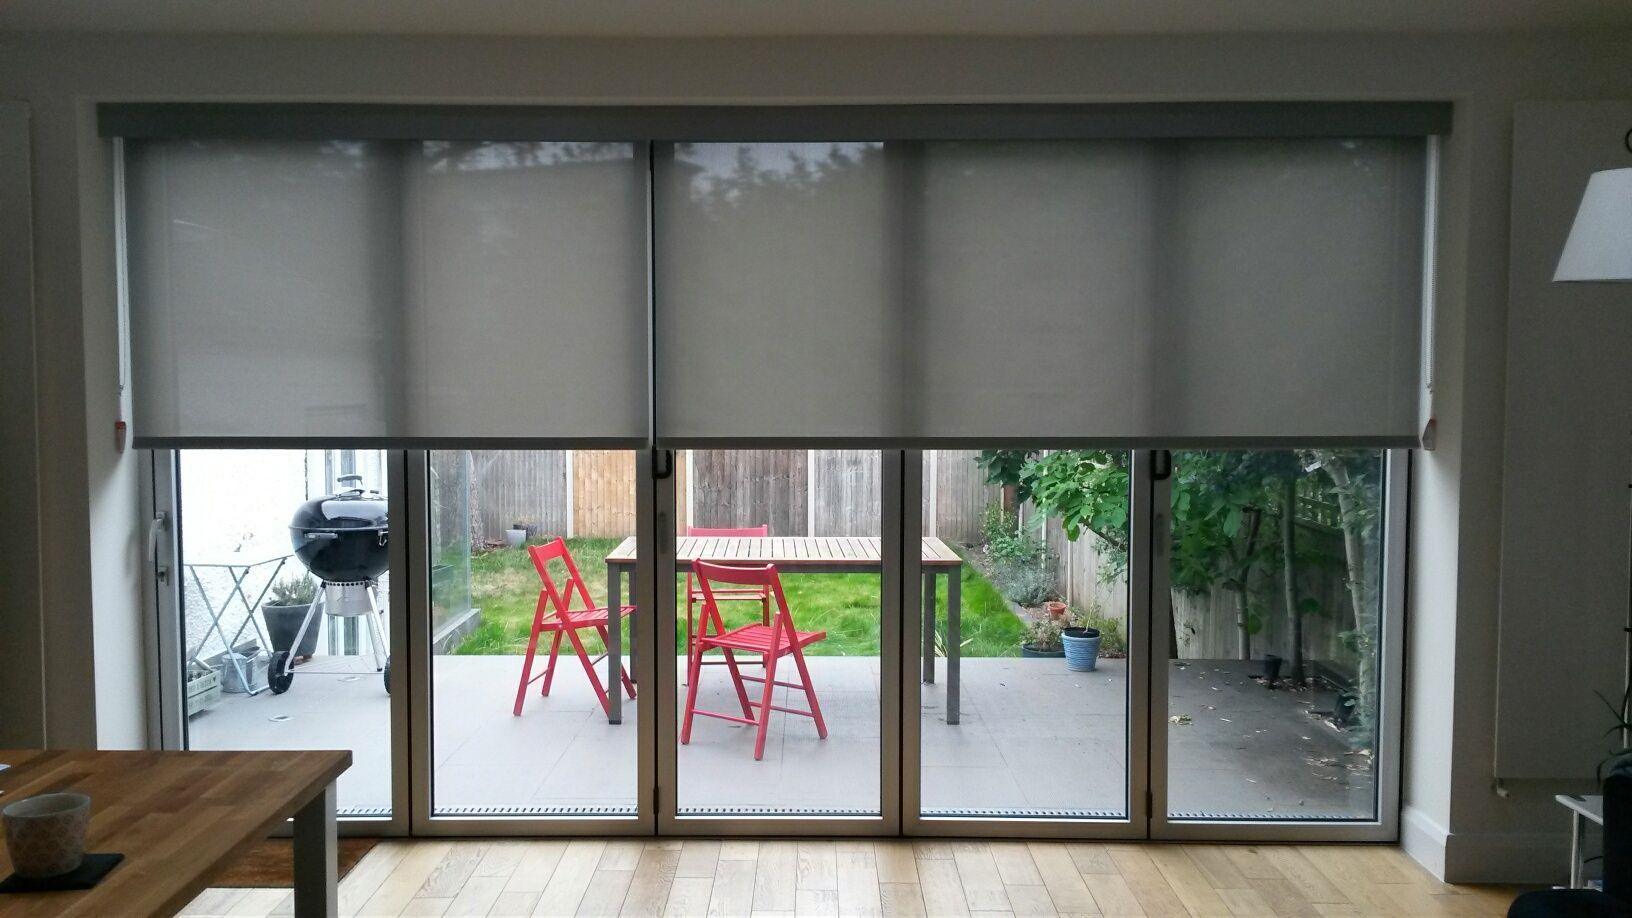 Blfold door blinds specialist screen fabrics cover huge areas by